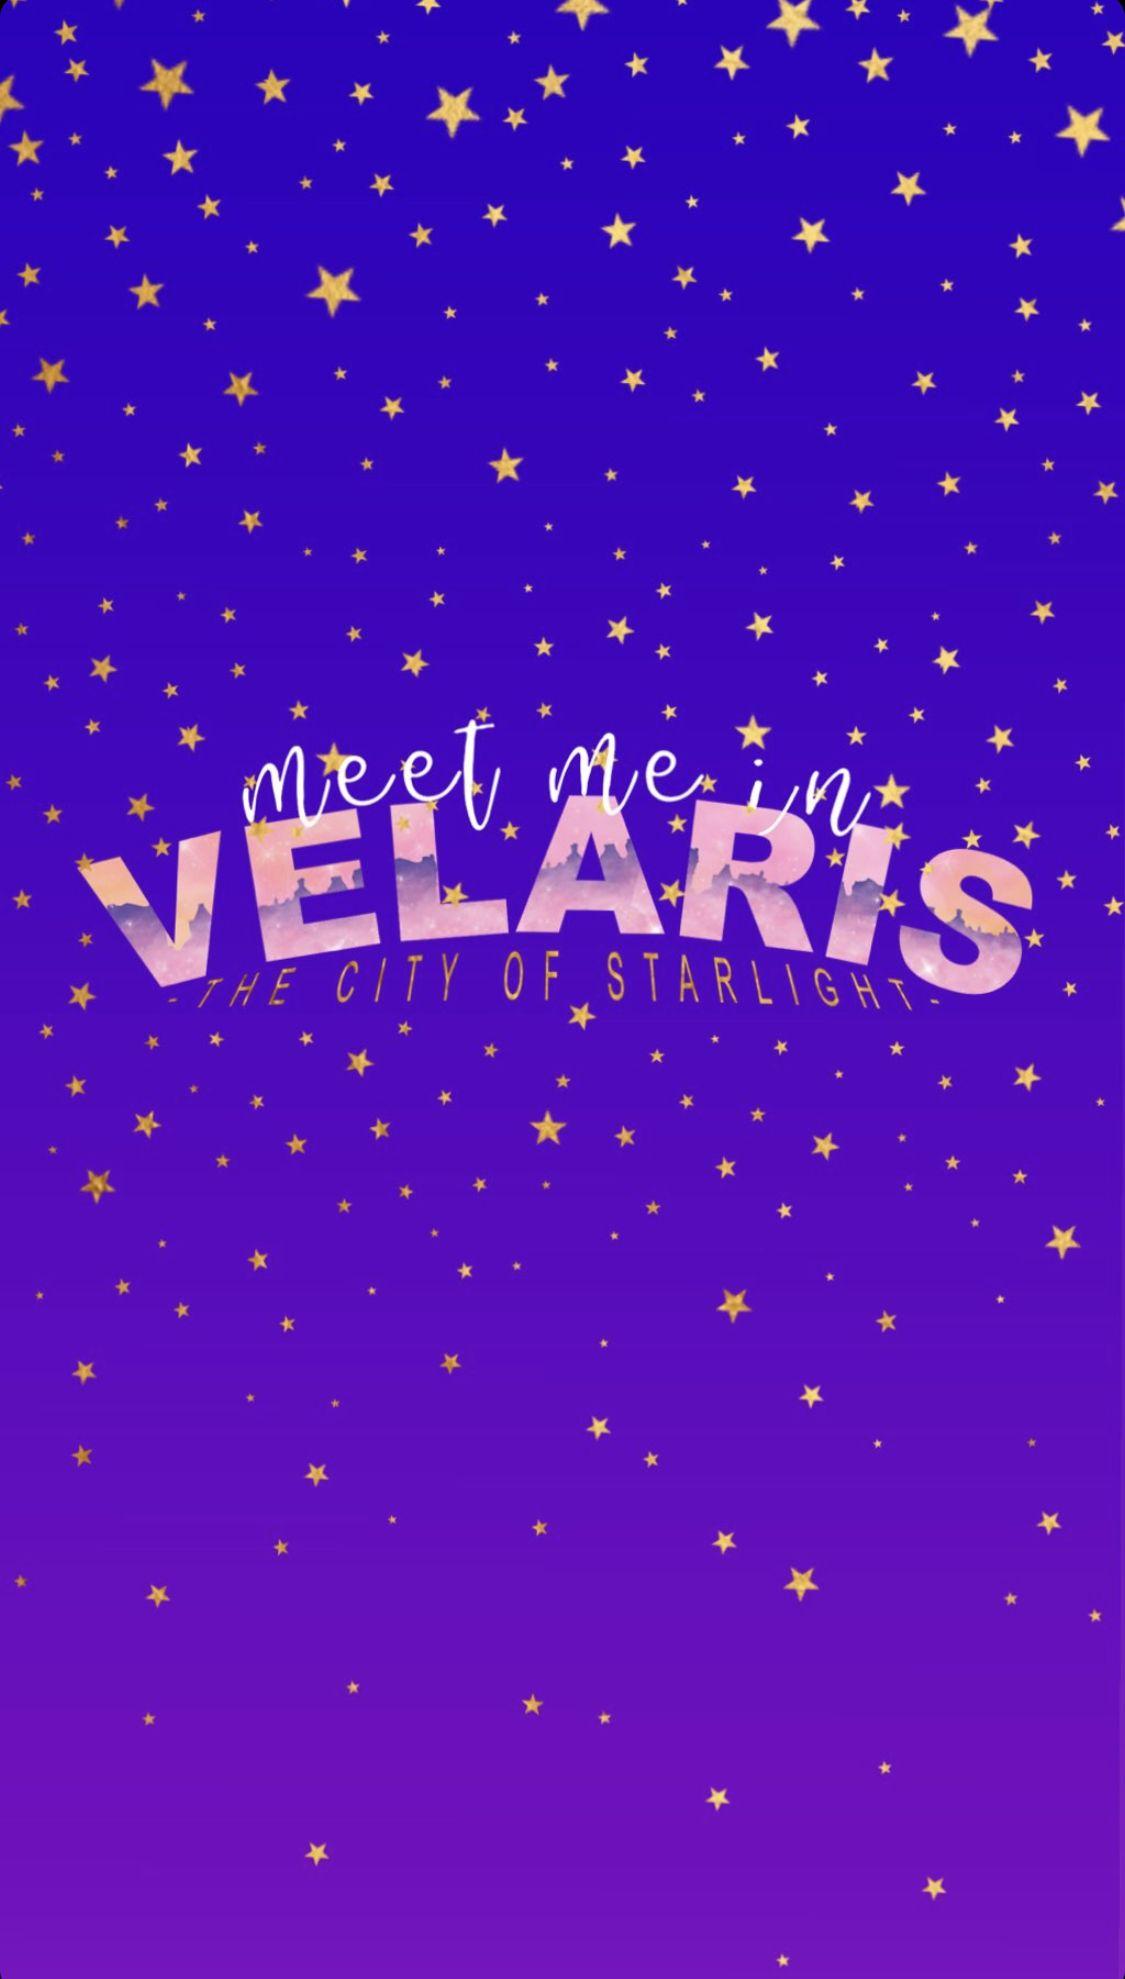 Velaris T Shirt City Of Starlight Shirt Acomaf Shirt Etsy Starlight Floral Tshirts Acomaf